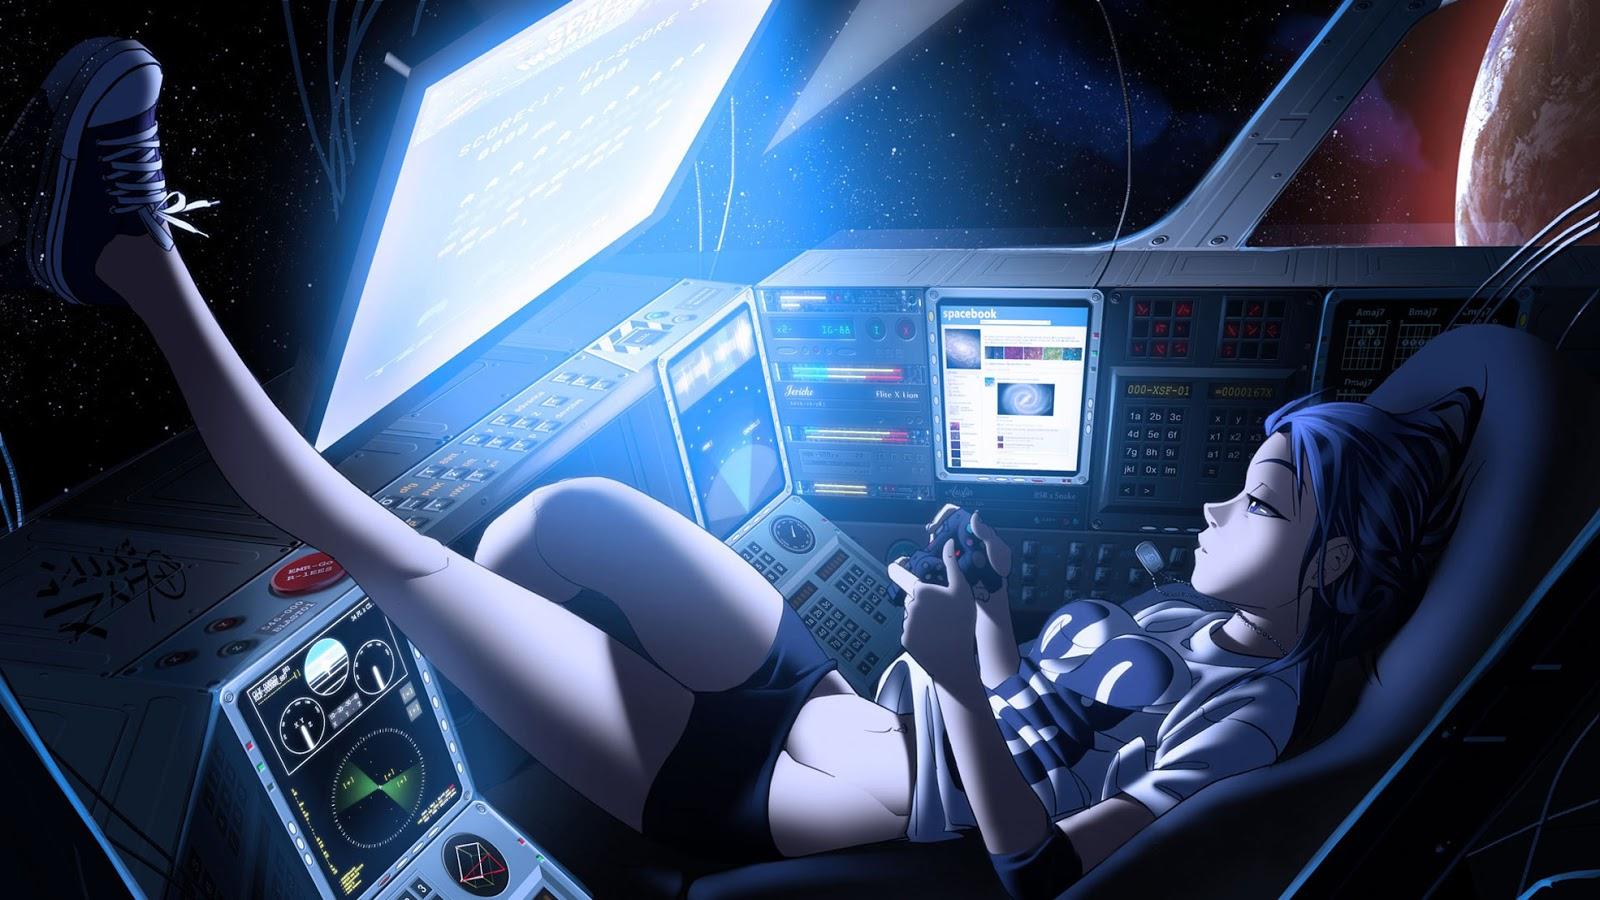 Games Nigh Girl Female Anime HD Wallpaper Desktop PC Background 2010 1600x900